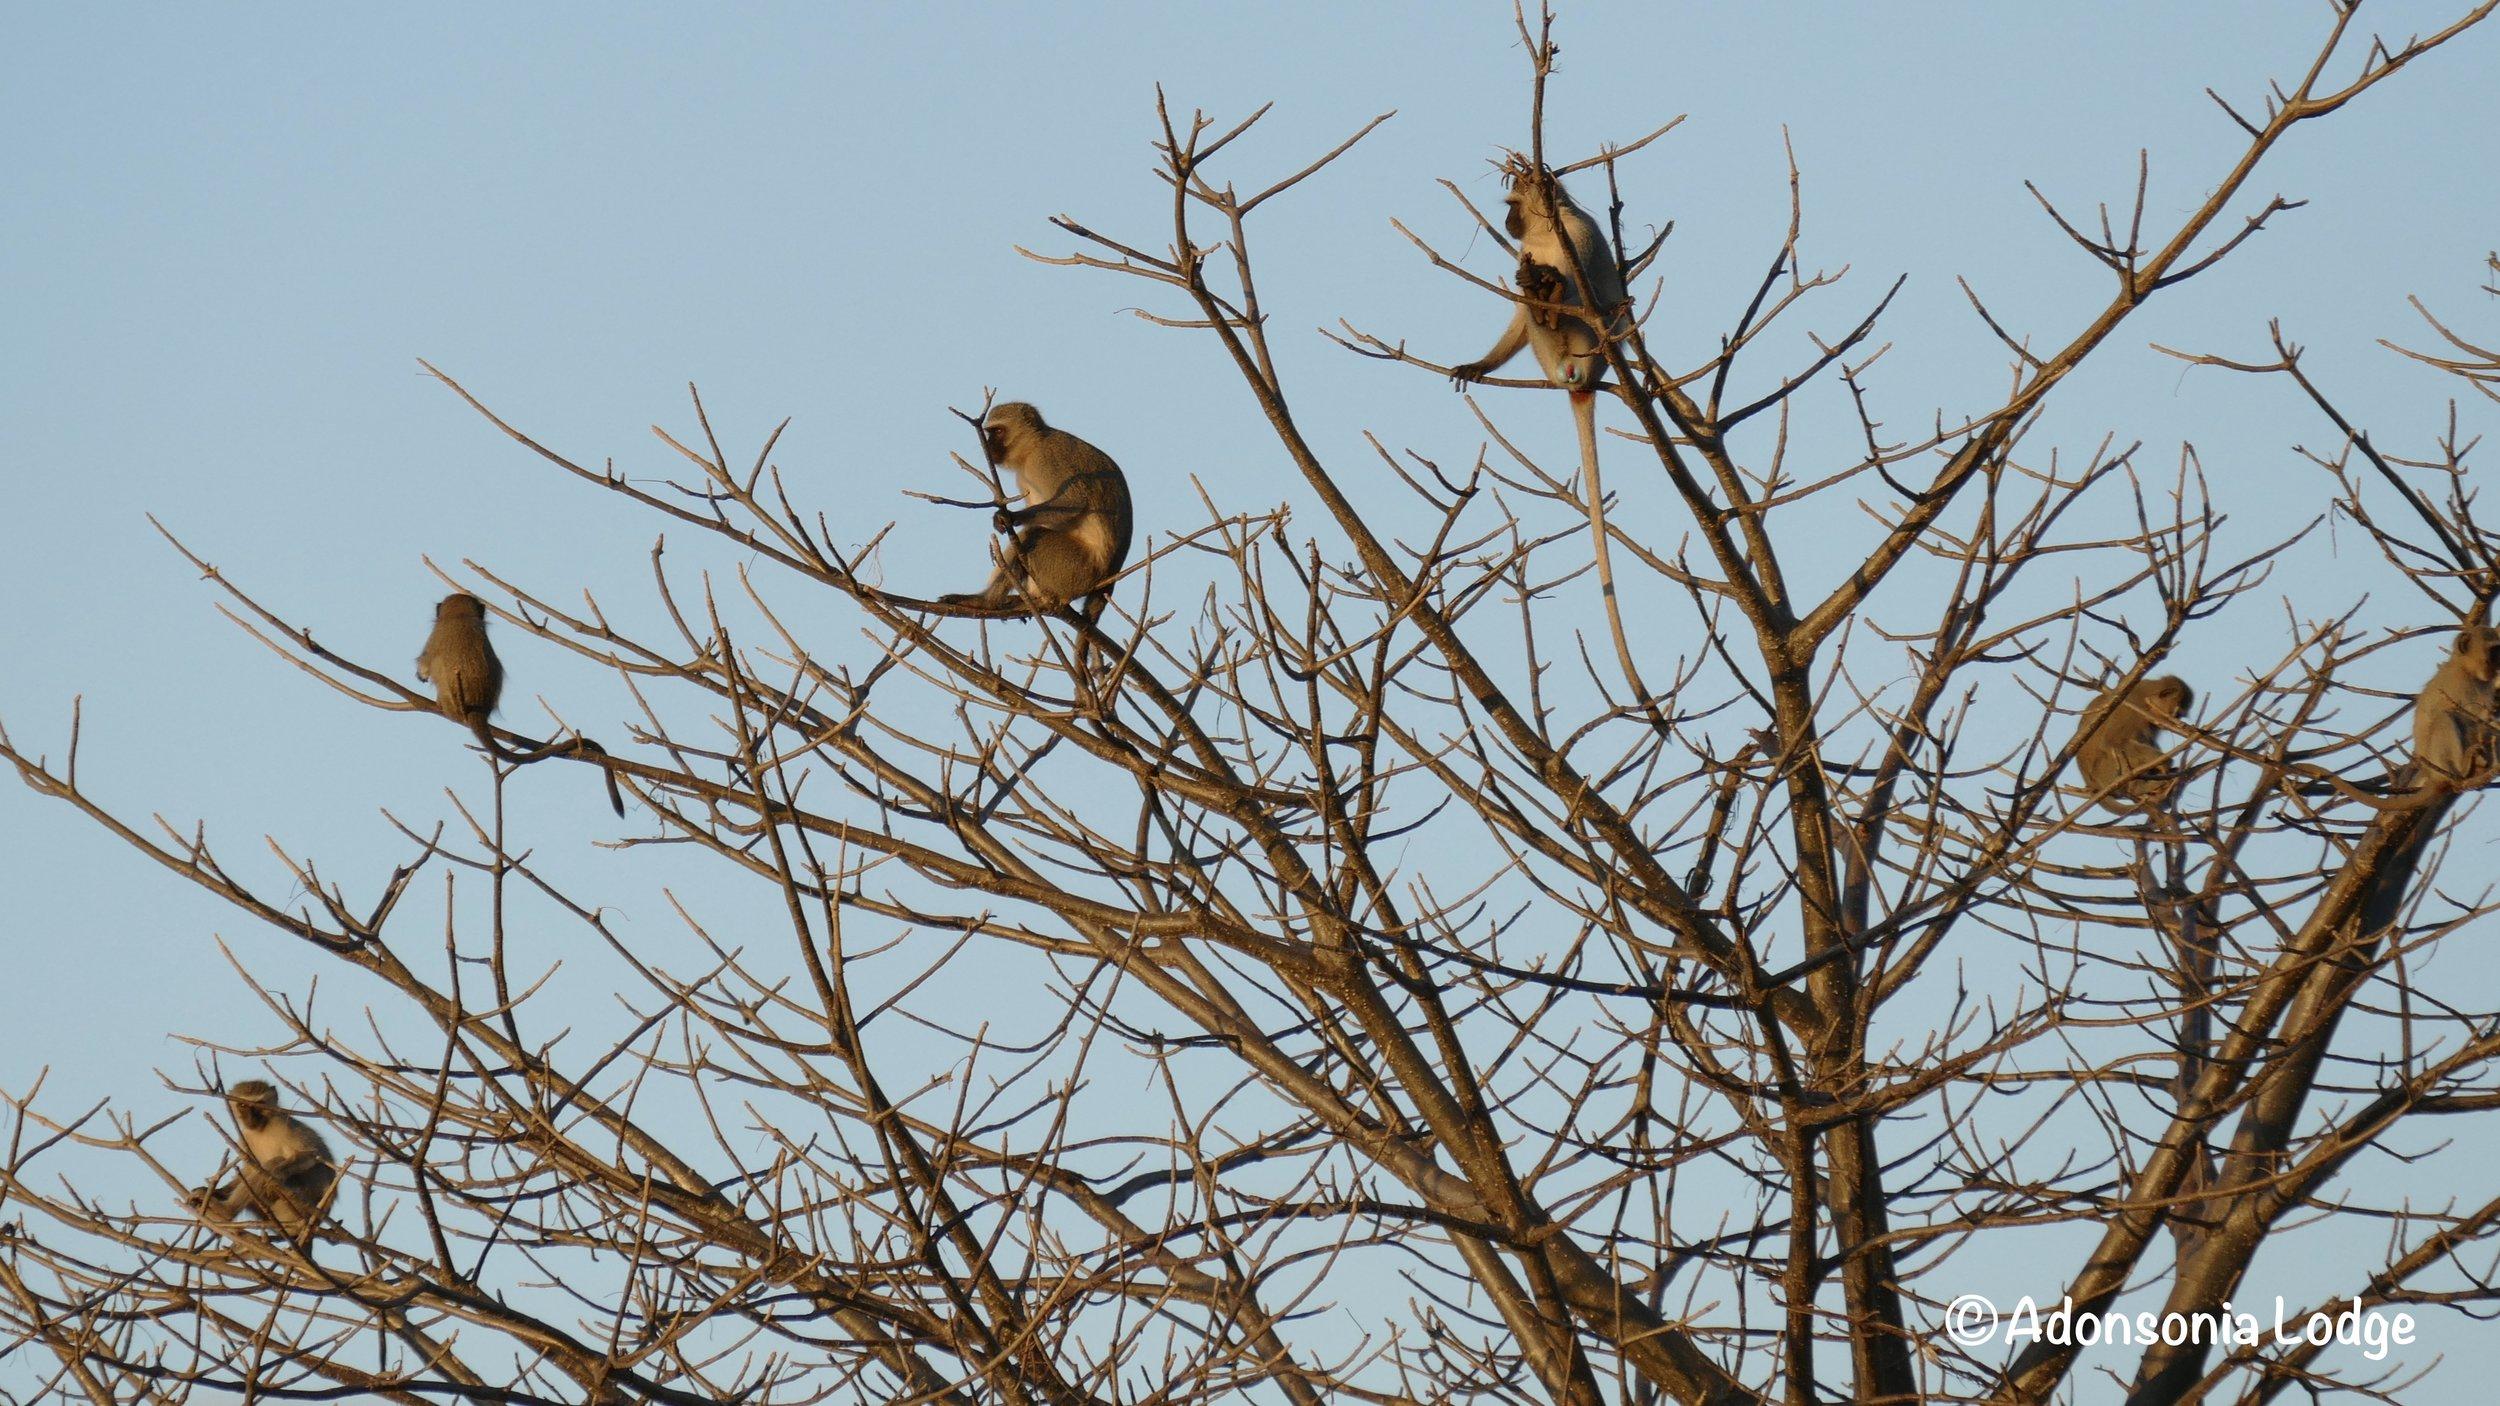 Monkeys on the lookout